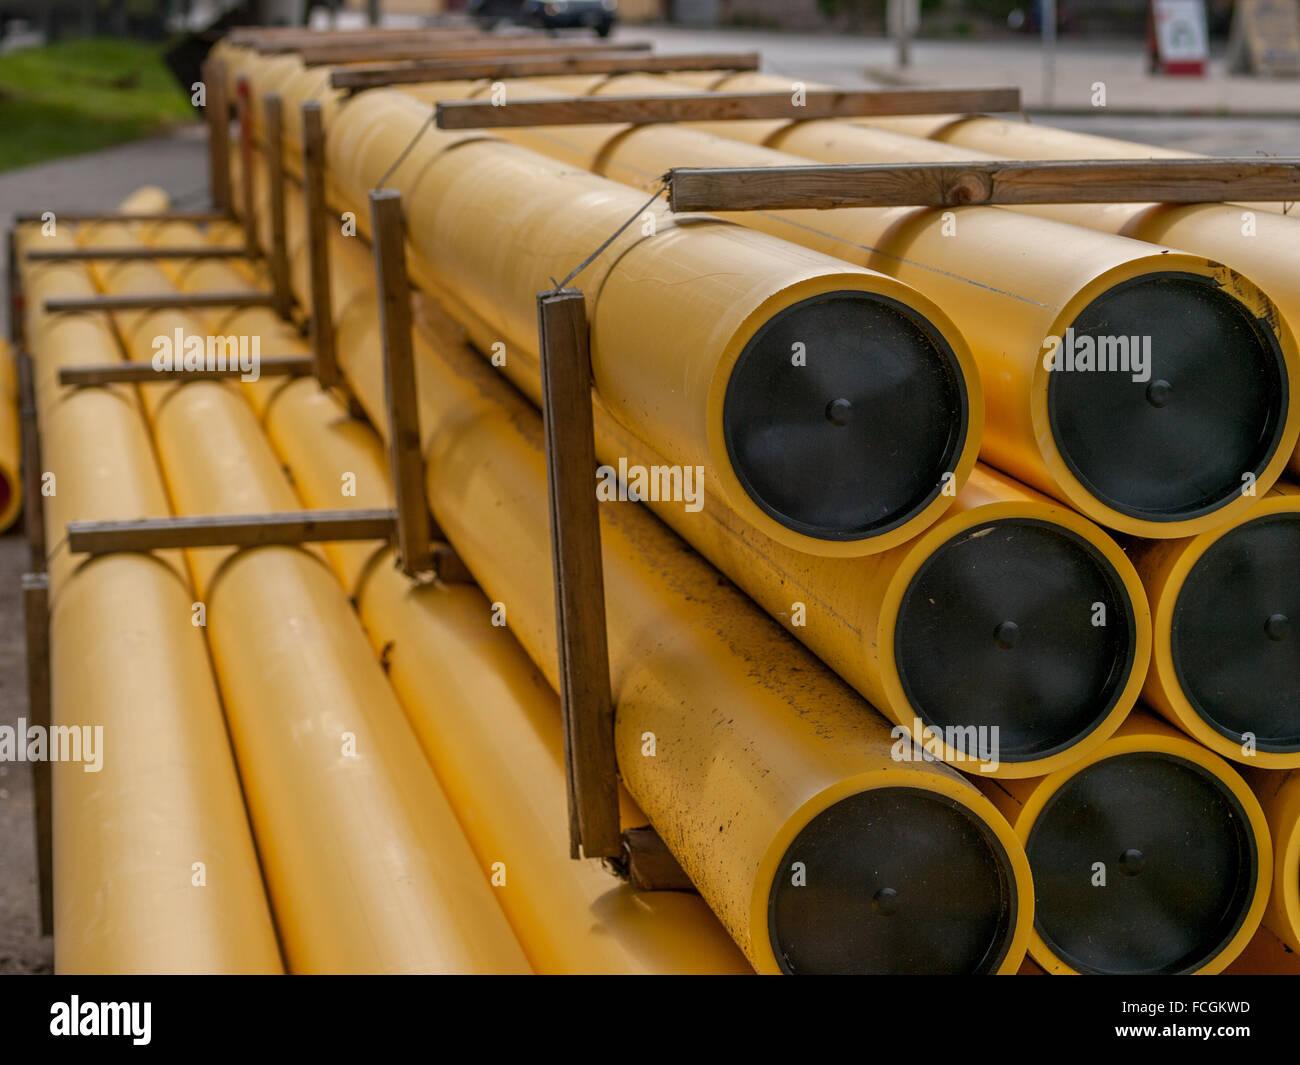 Plastic Pipes Stockfotos & Plastic Pipes Bilder - Alamy